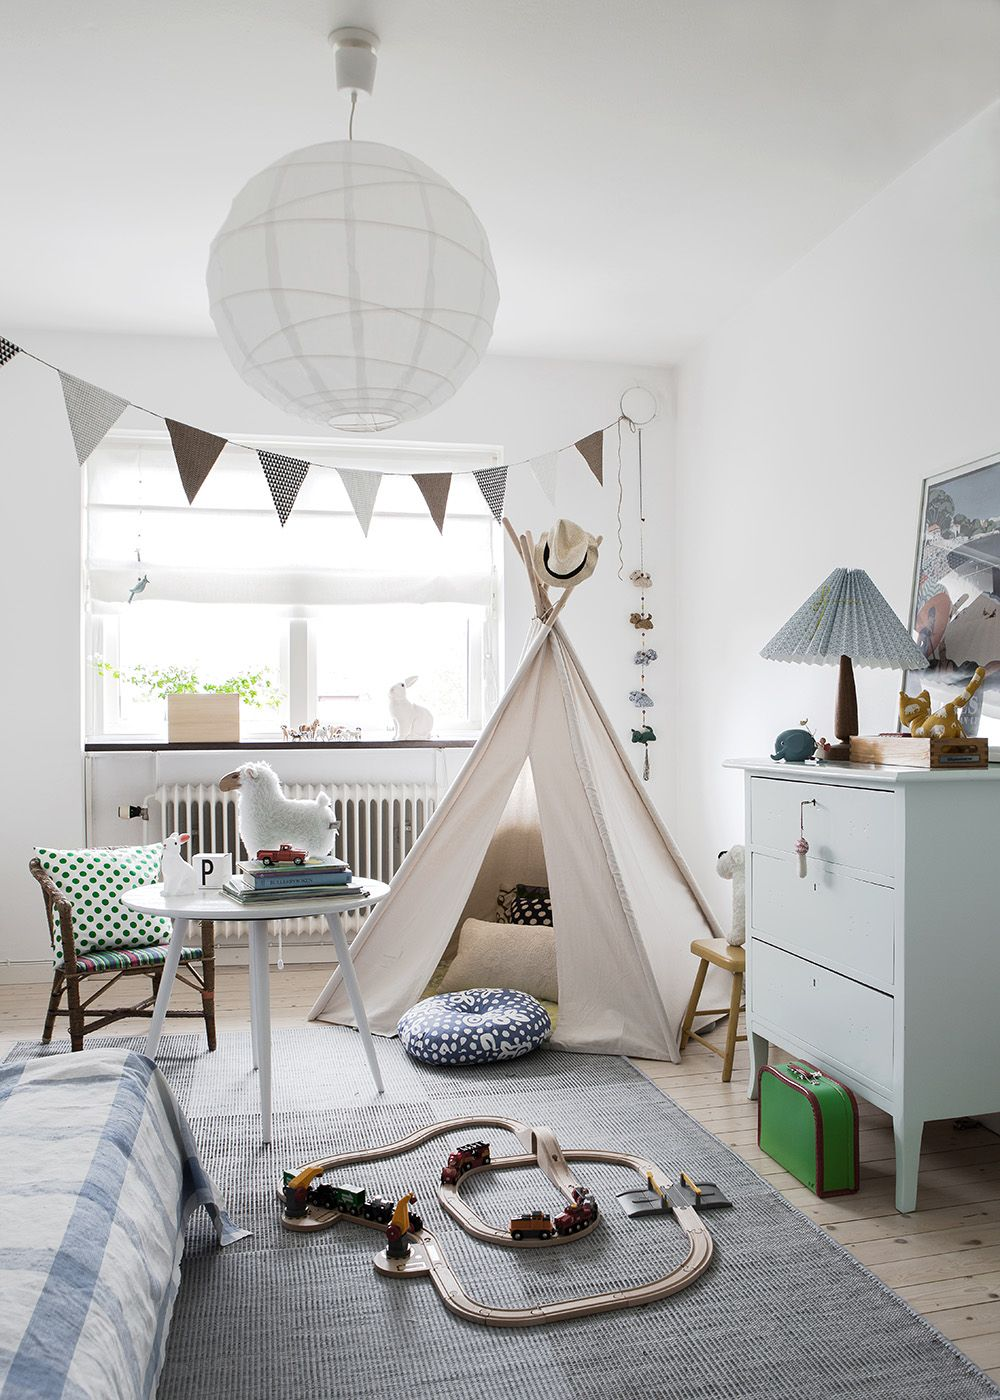 Vintage mädchen zimmer dekor kids room with a teepee  kids  pinterest  kids rooms room and